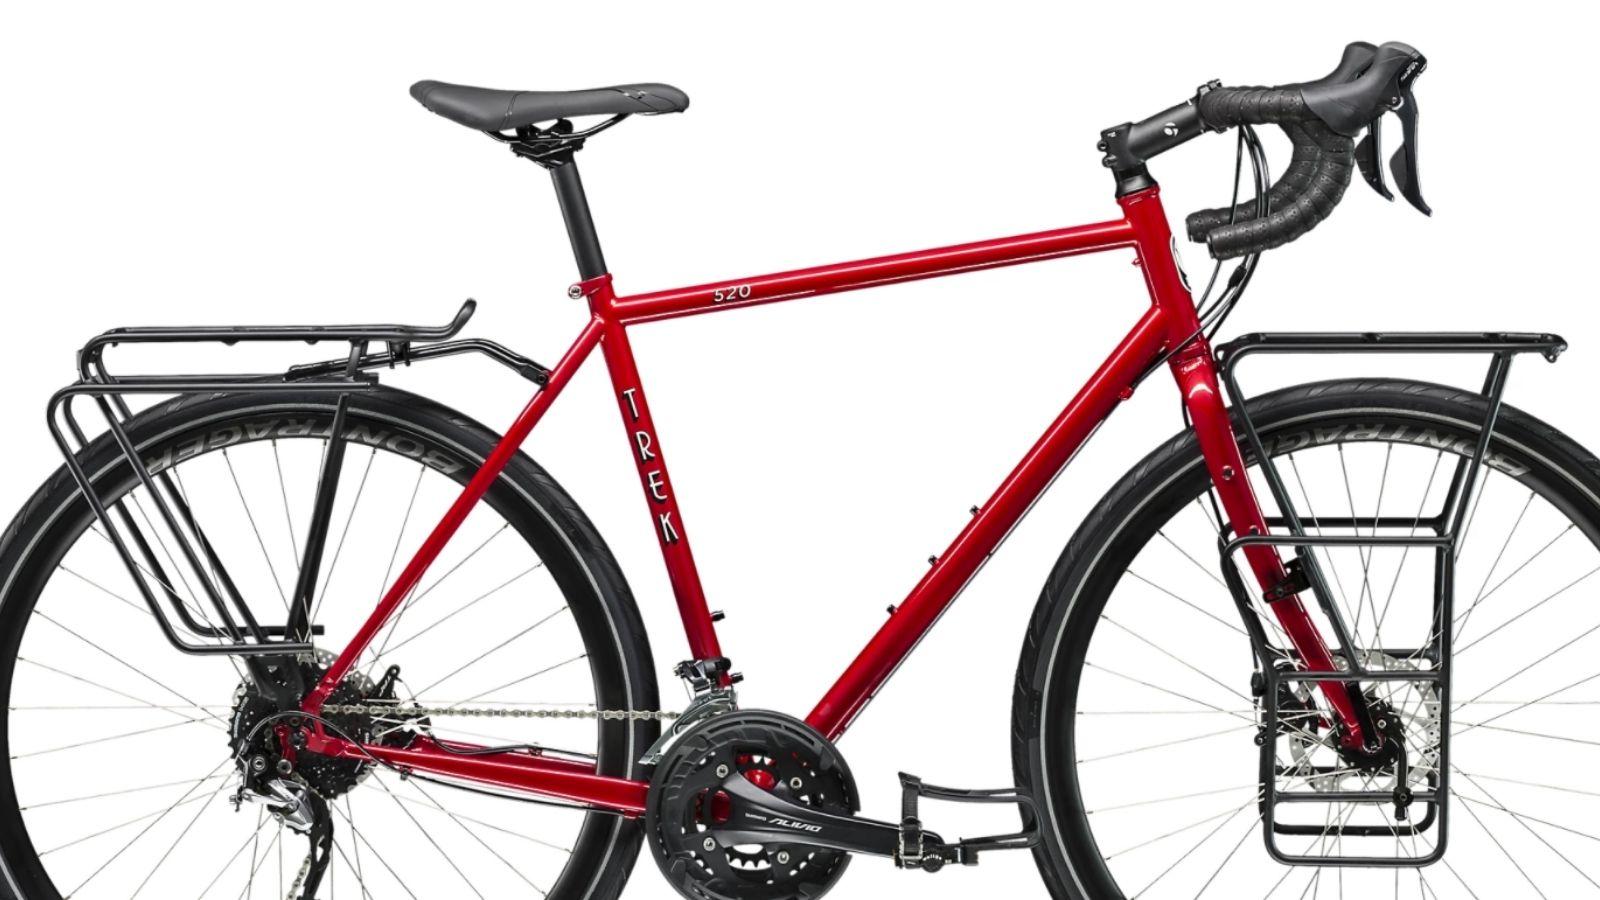 La bici da cicloturismo Trek 520 Disc